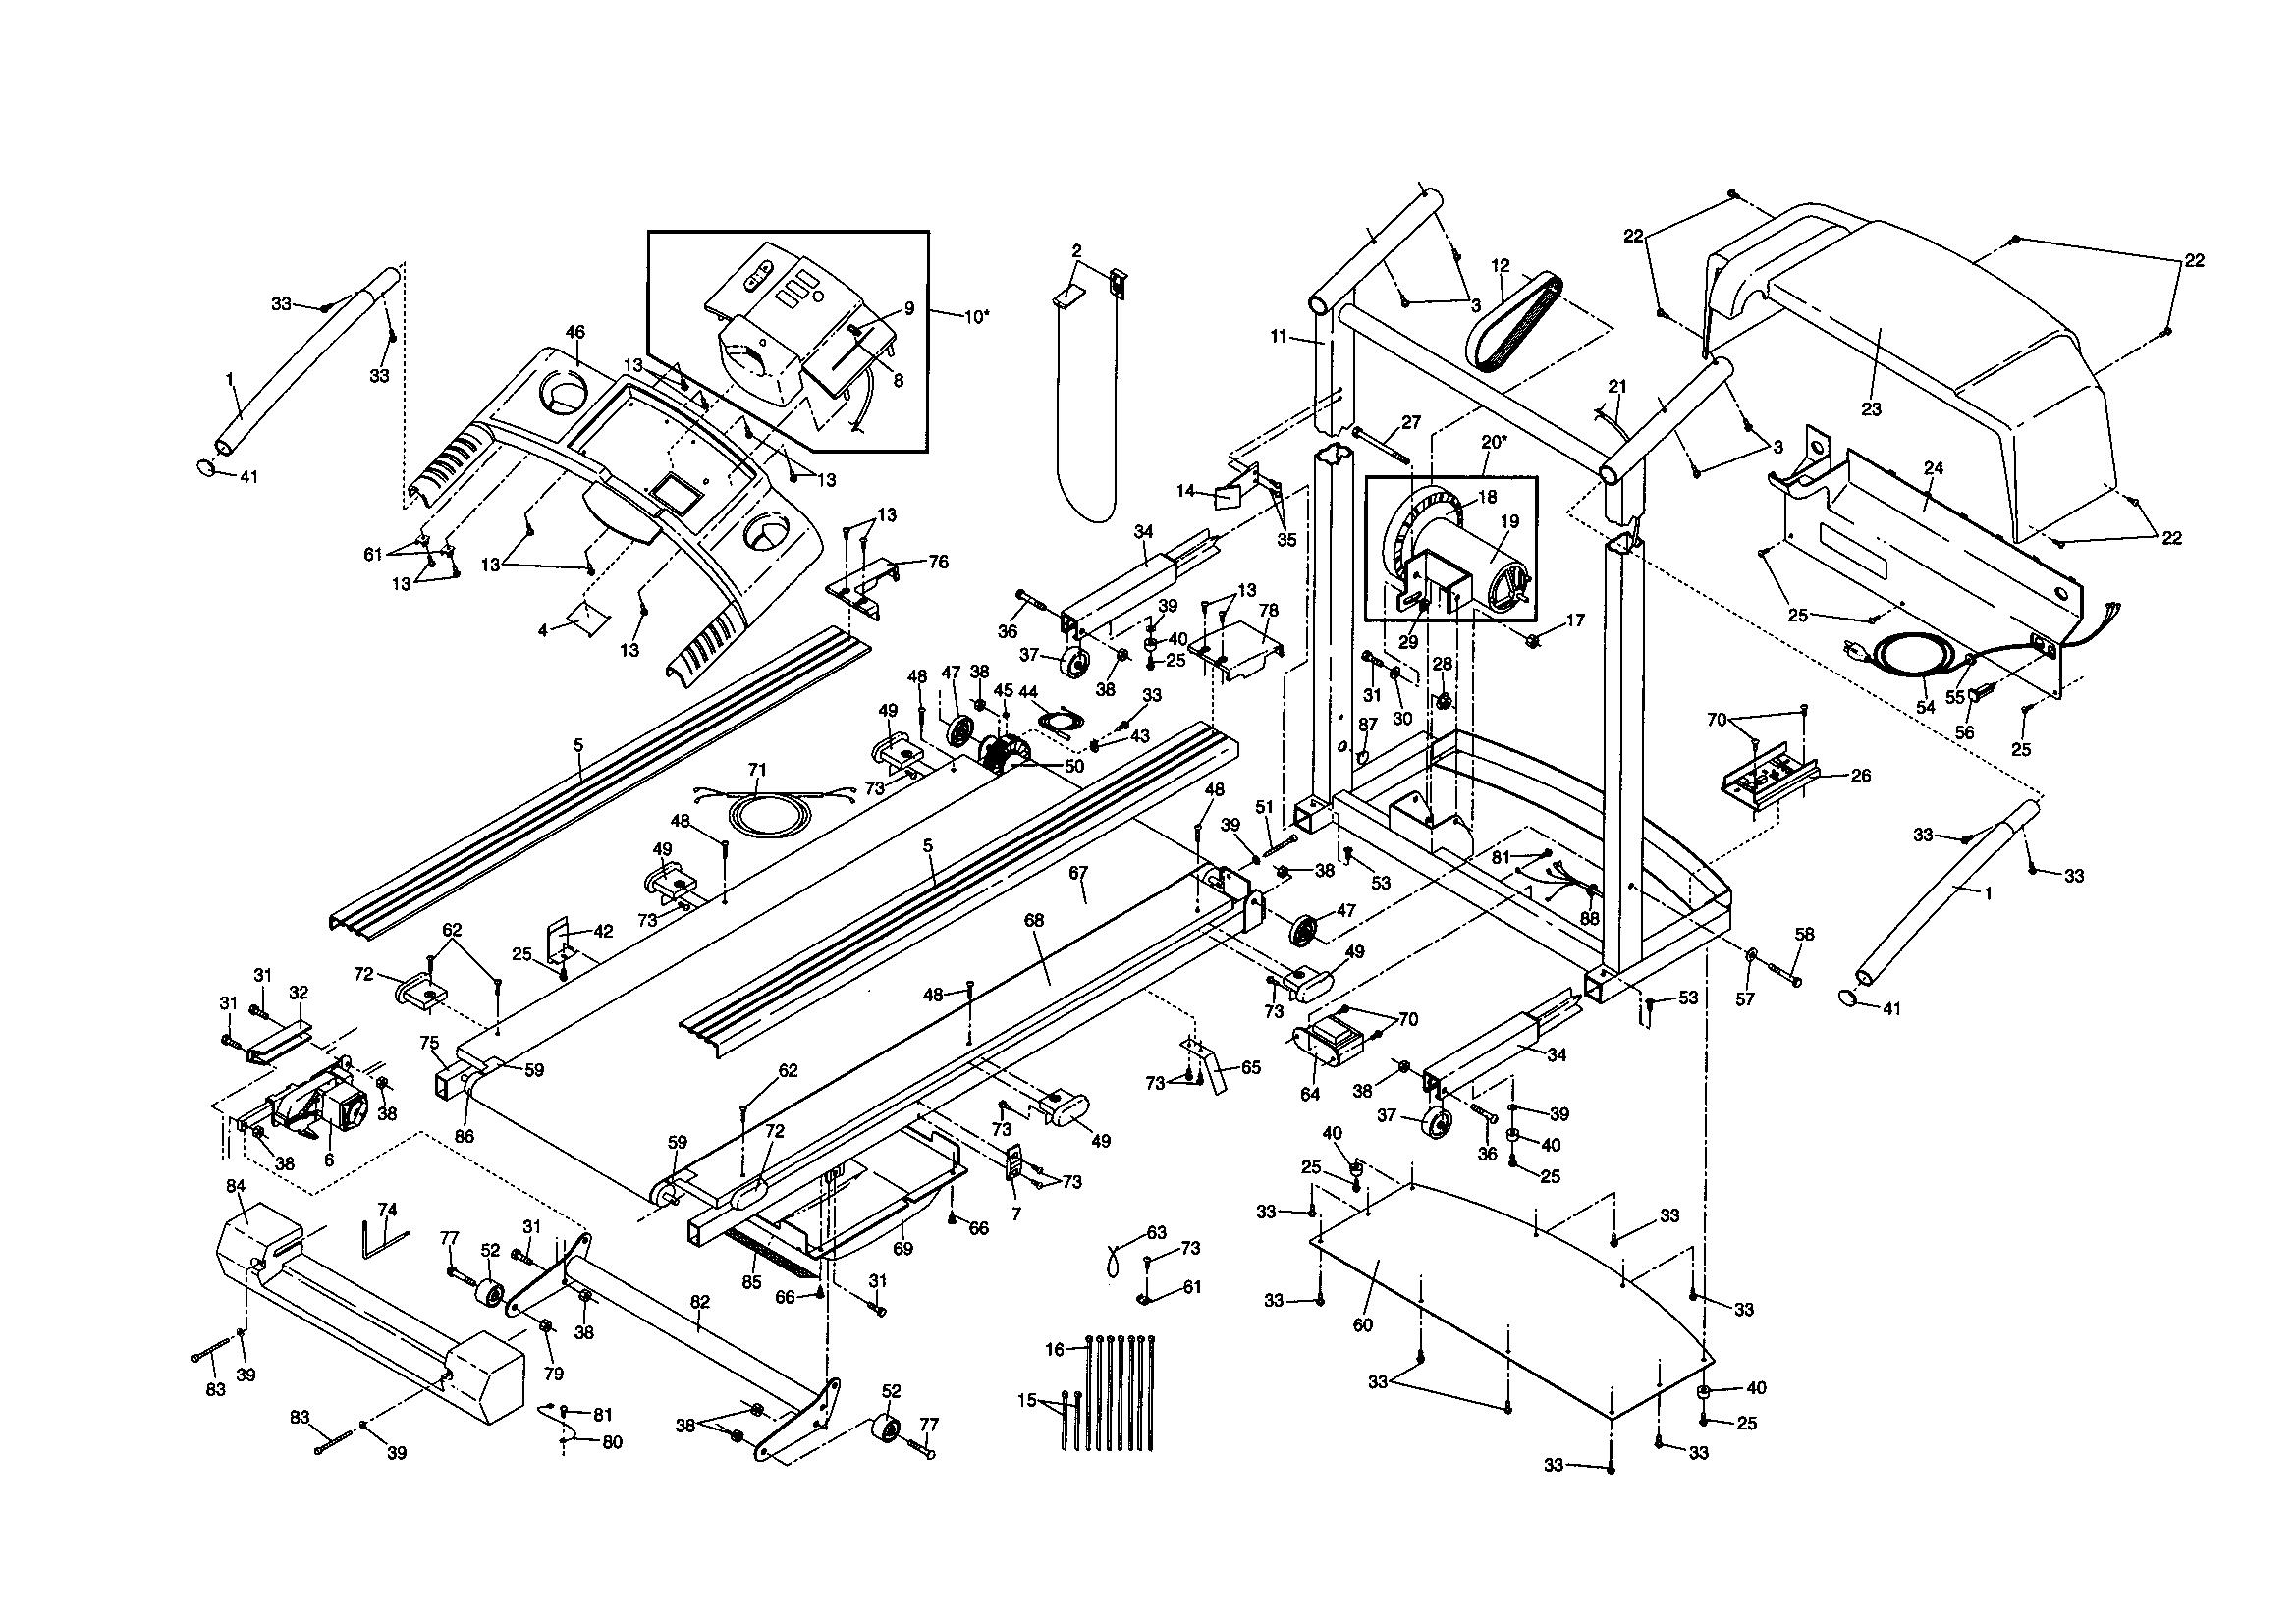 Proform model 831299200 treadmill genuine parts